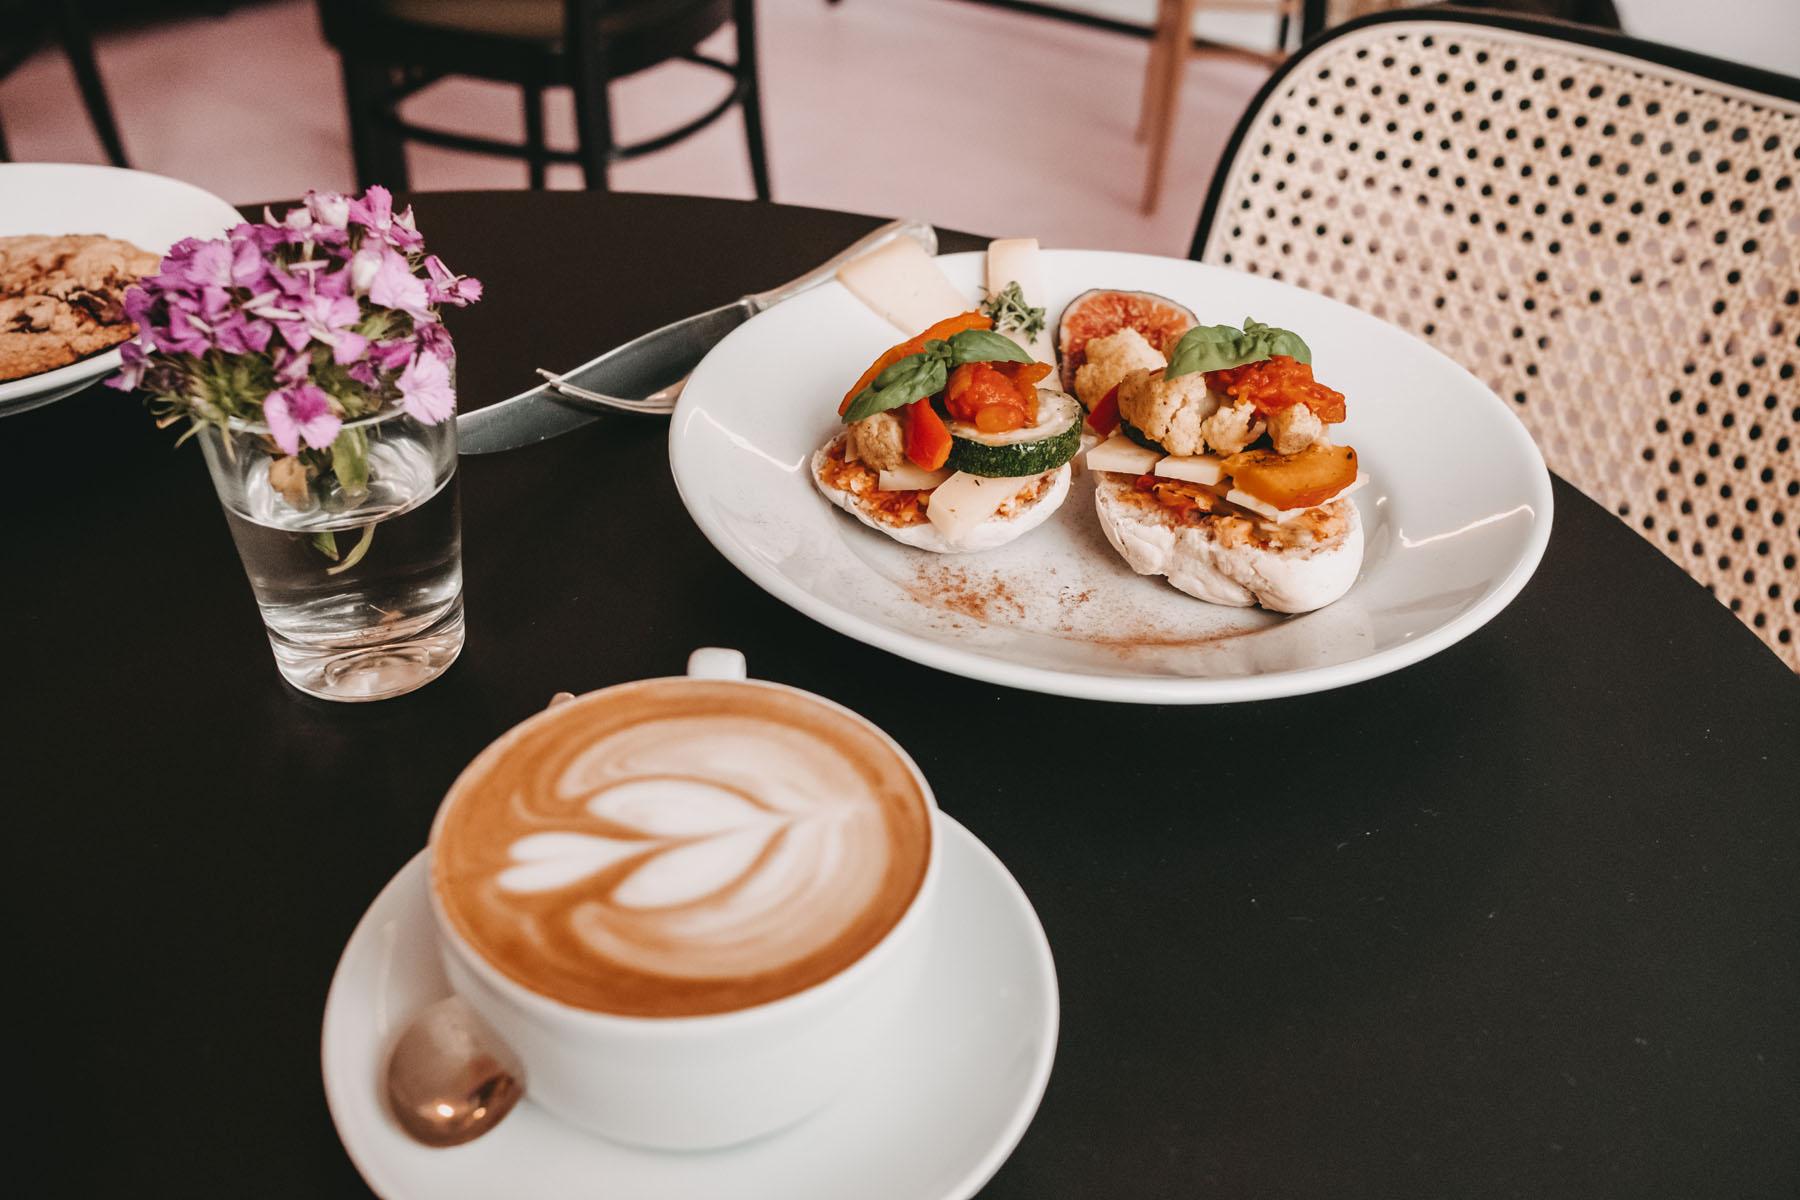 teikei karoviertel cafe geheimtipp hamburg dahlina sophie kock 1